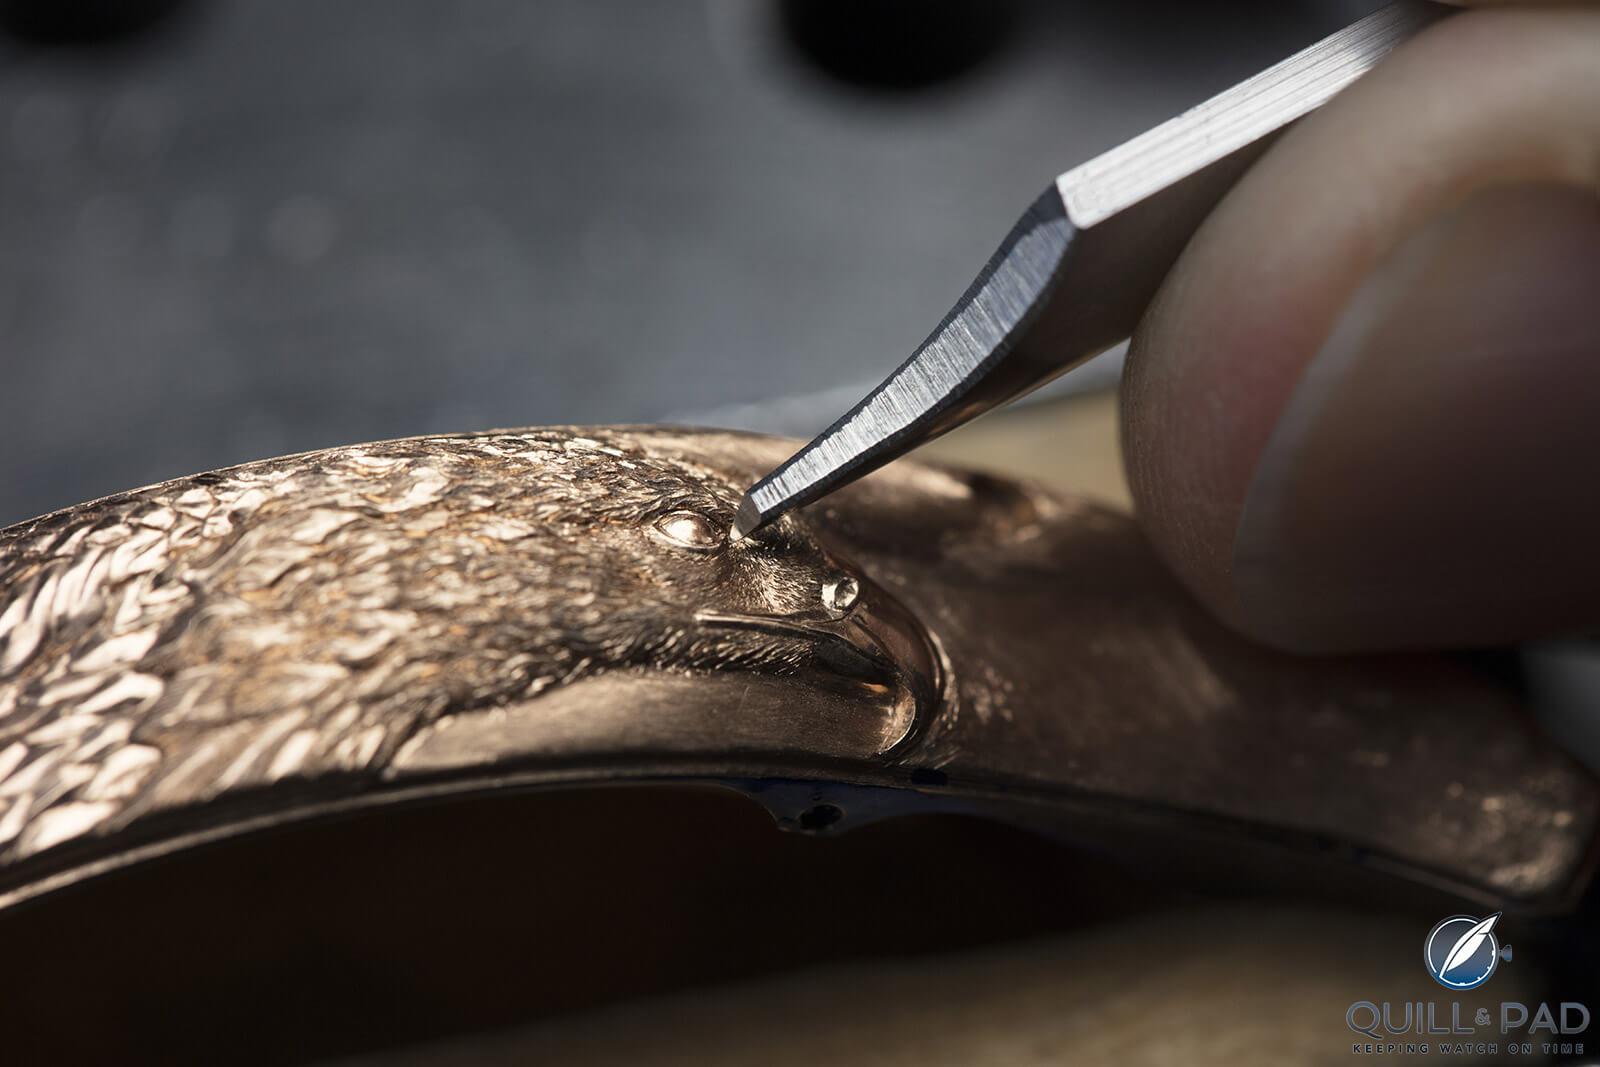 Engraving an eagle's head into the caseband of a Vacheron Constantin Les Cabinotiers Mécaniques unique piece